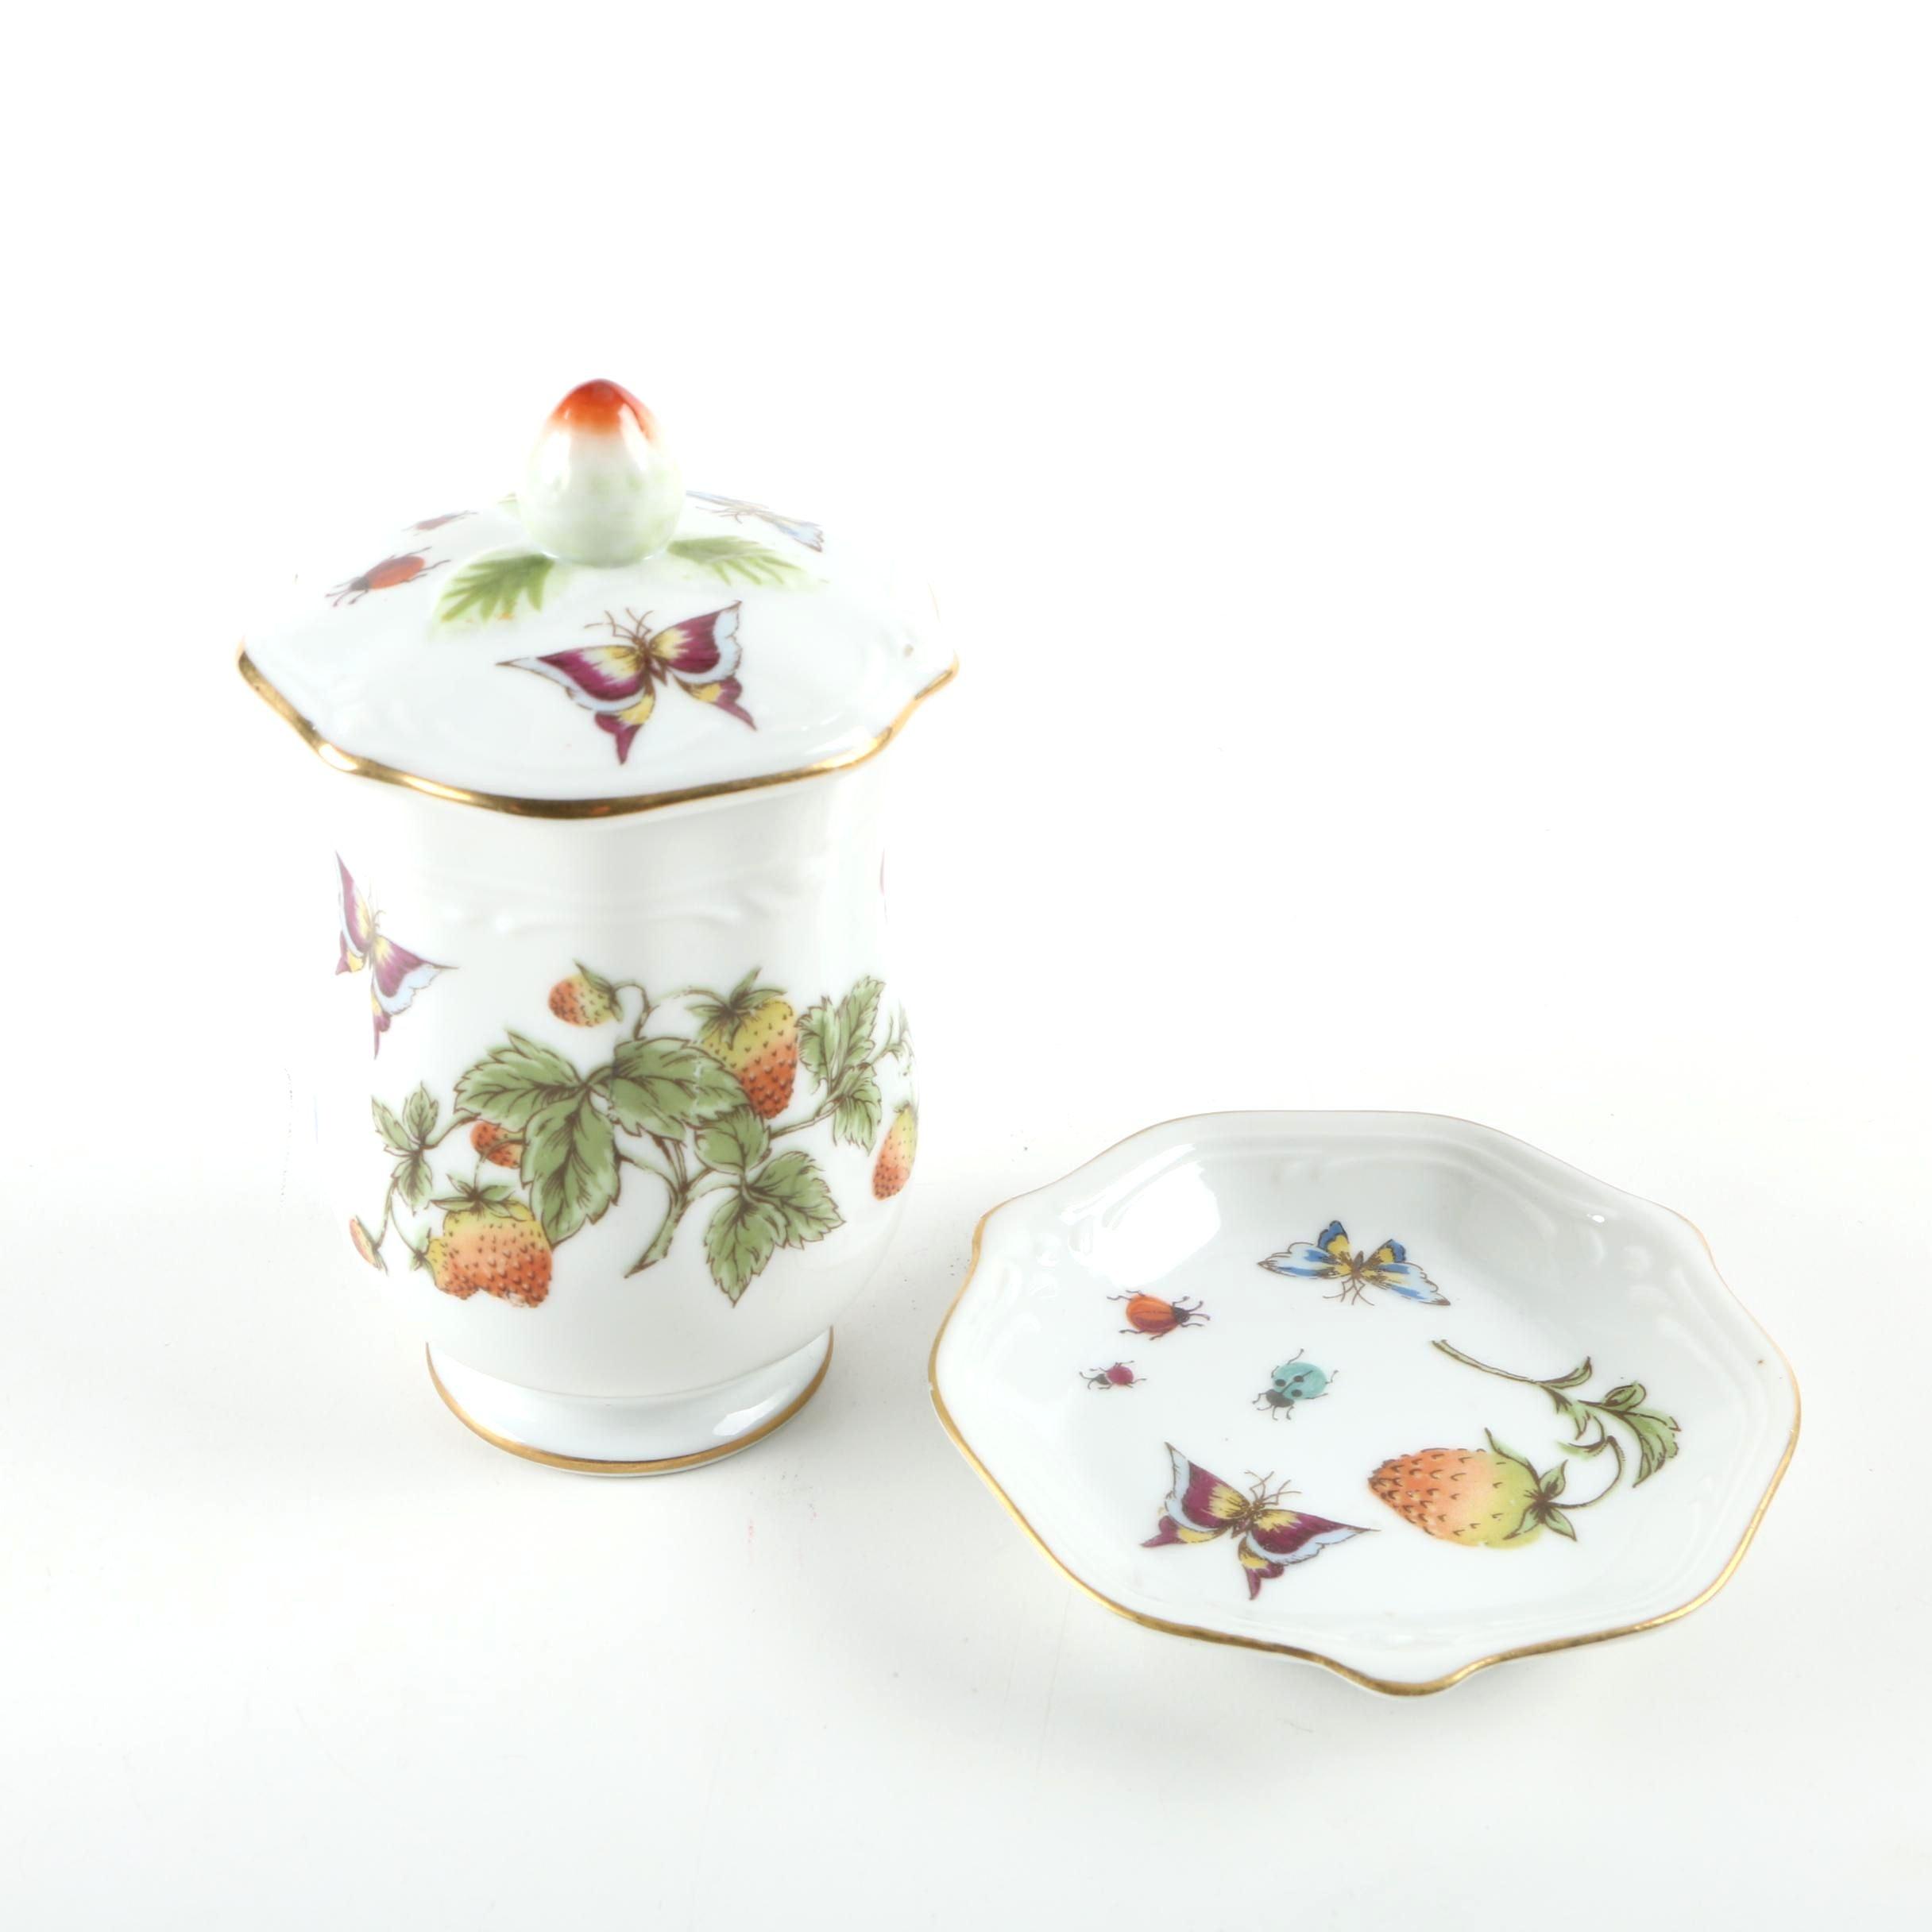 Lenwile Ardalt Hand-Painted Porcelain Jam Jar & Saucer